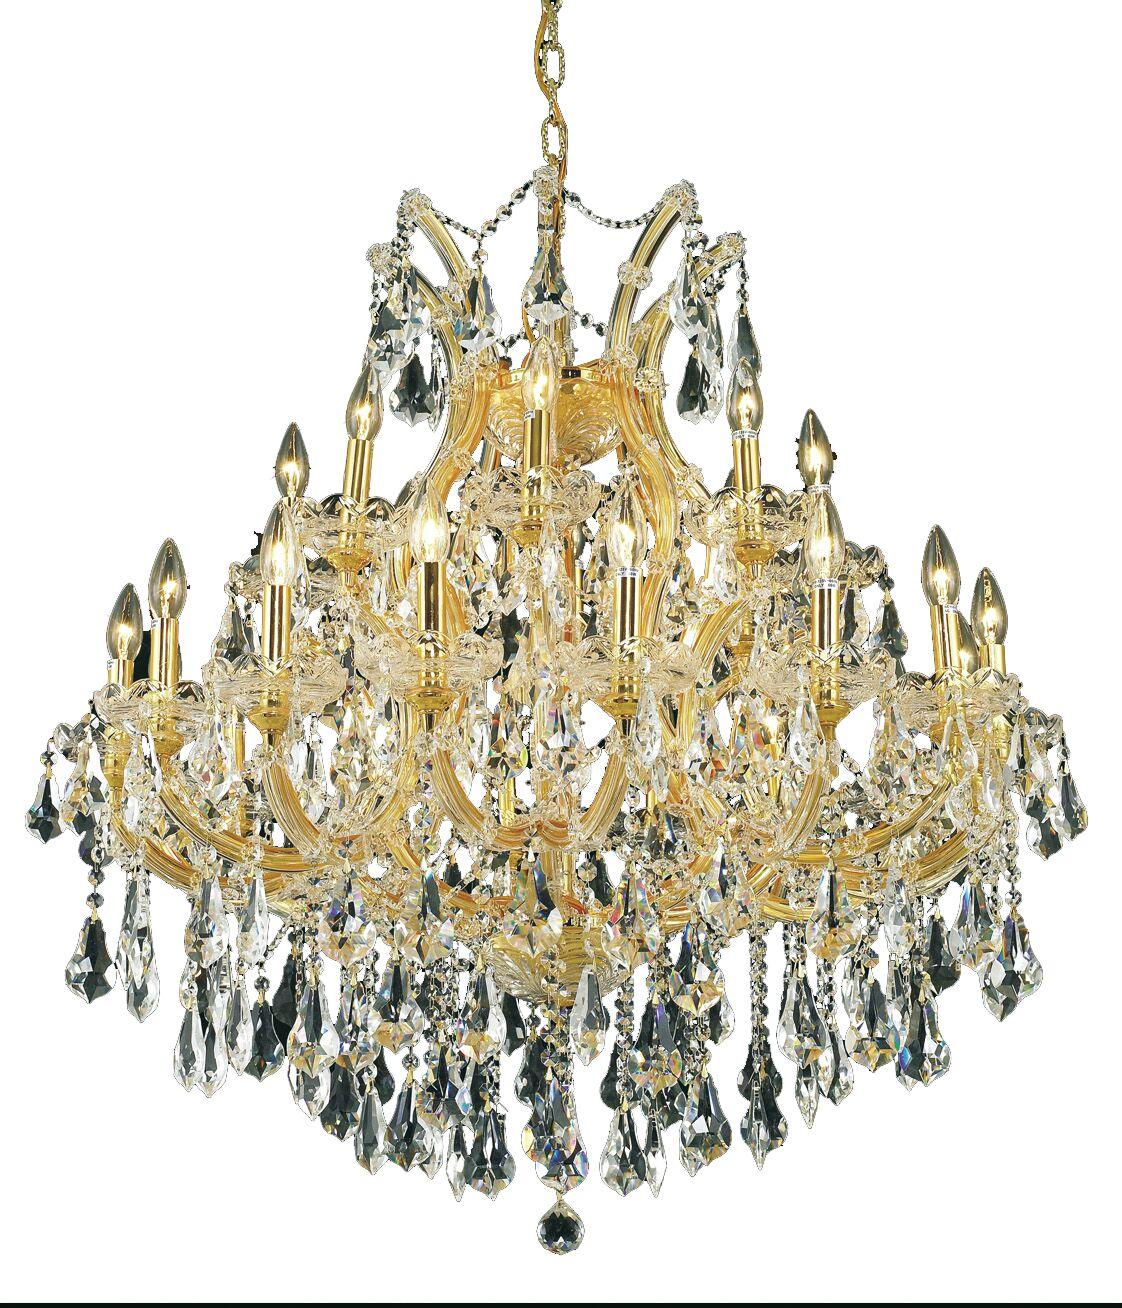 Regina Traditional 24-Light Royal Cut Chain Candle Style Chandelier Finish / Crystal Finish / Crystal Trim: Chrome / Crystal (Clear) / Royal Cut